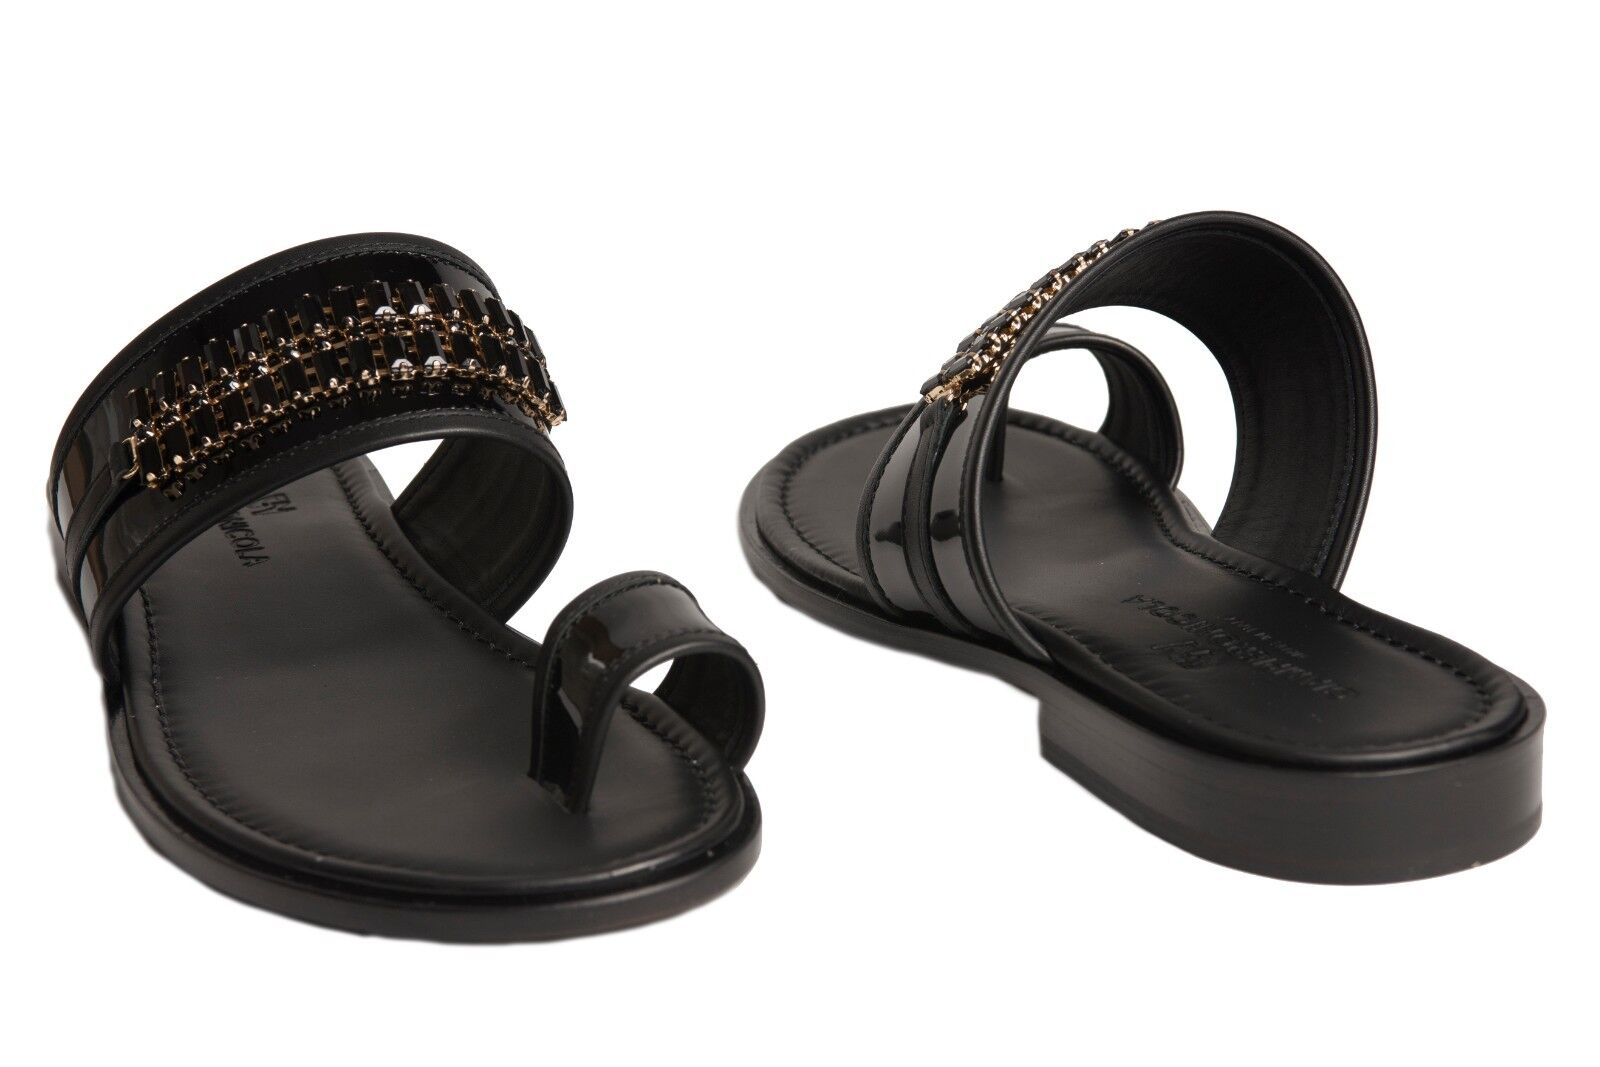 Giampieronicola  5431 B Italian mens black patent leather sandals with swarovski